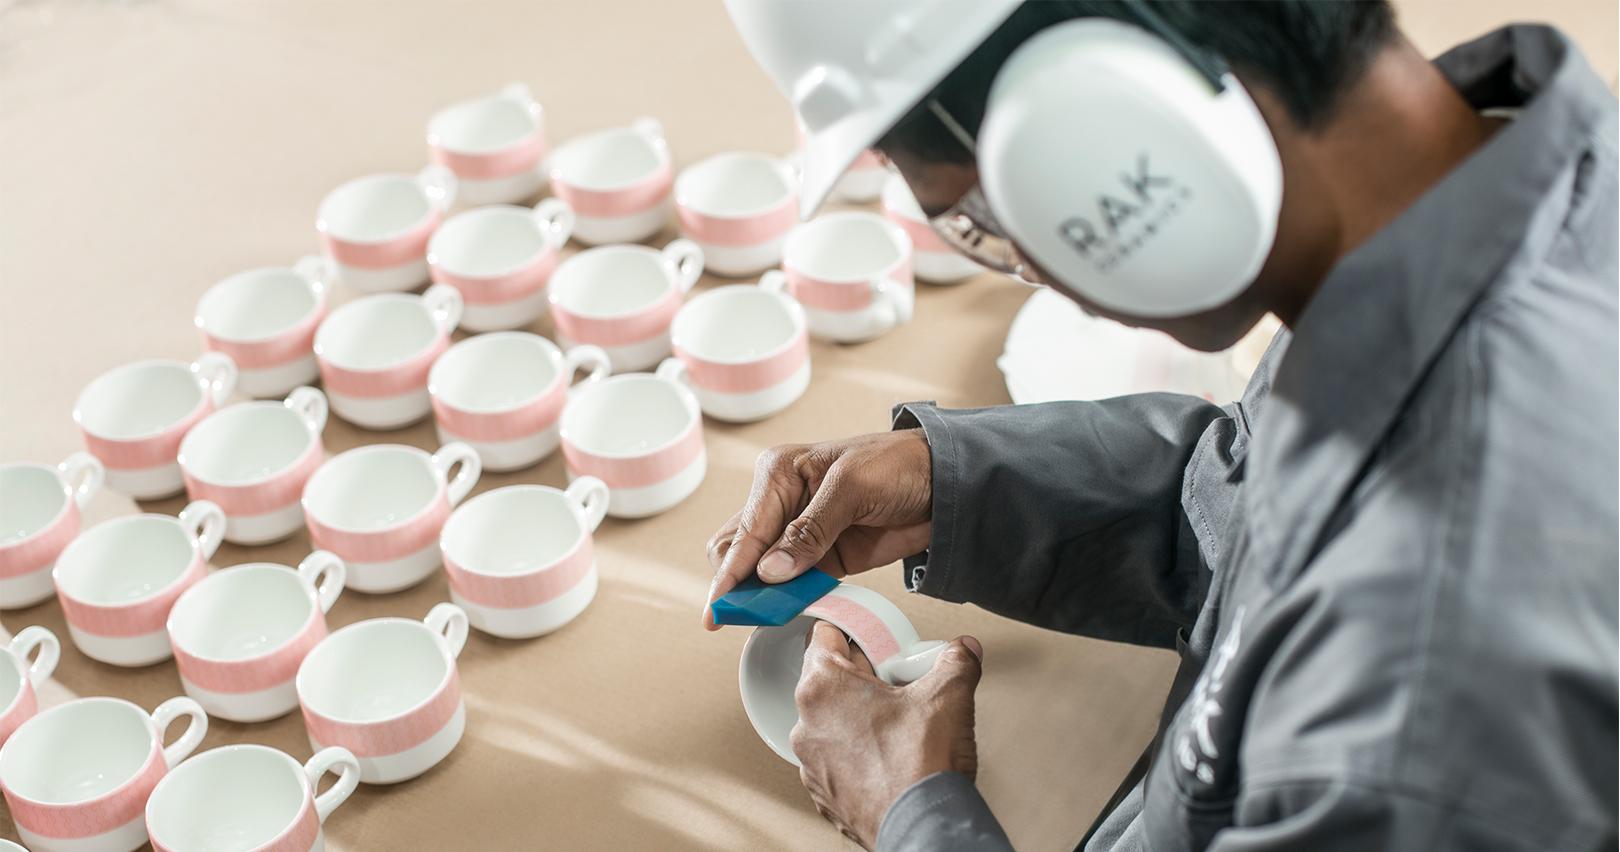 RAK Ceramics Sponsors Award at Prestigious Commercial Interior Design Awards, Dubai